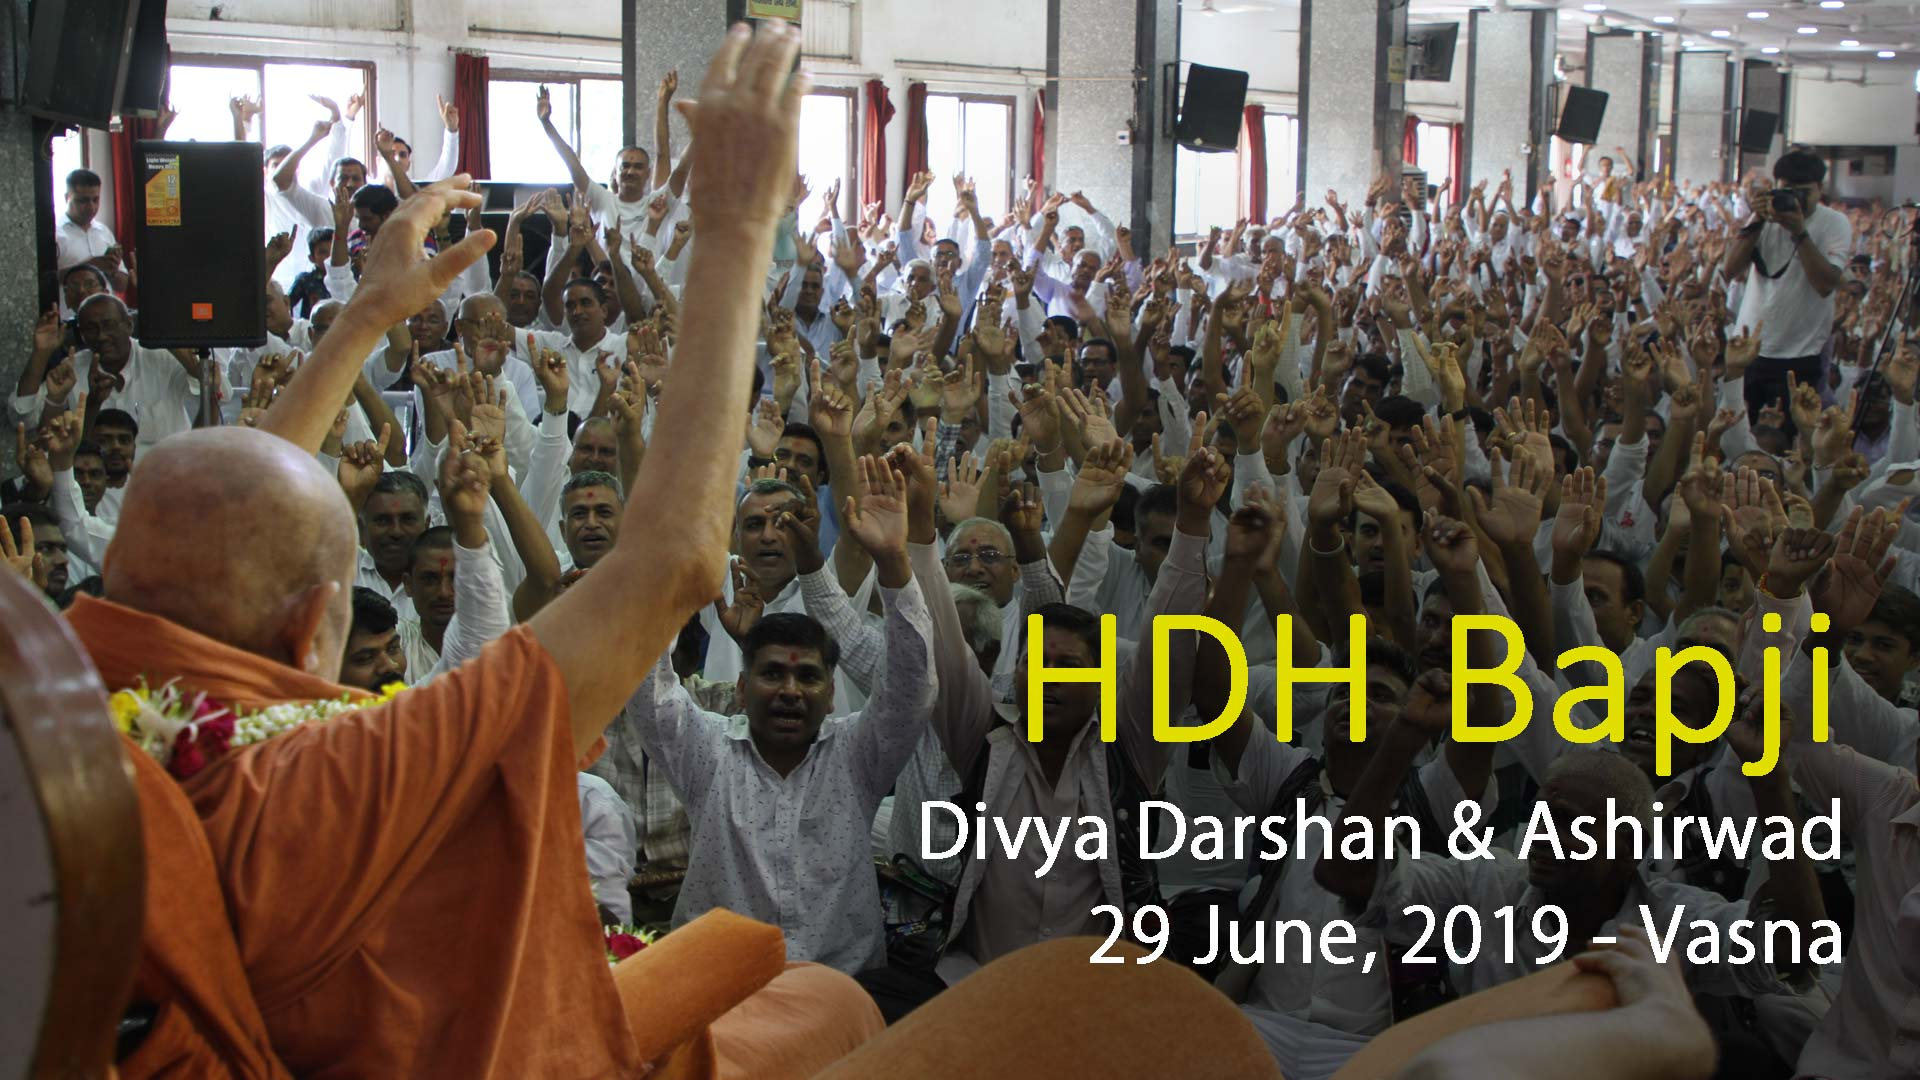 HDH Bapji Divya Darshan-Ashirwad | 29 June, 2019